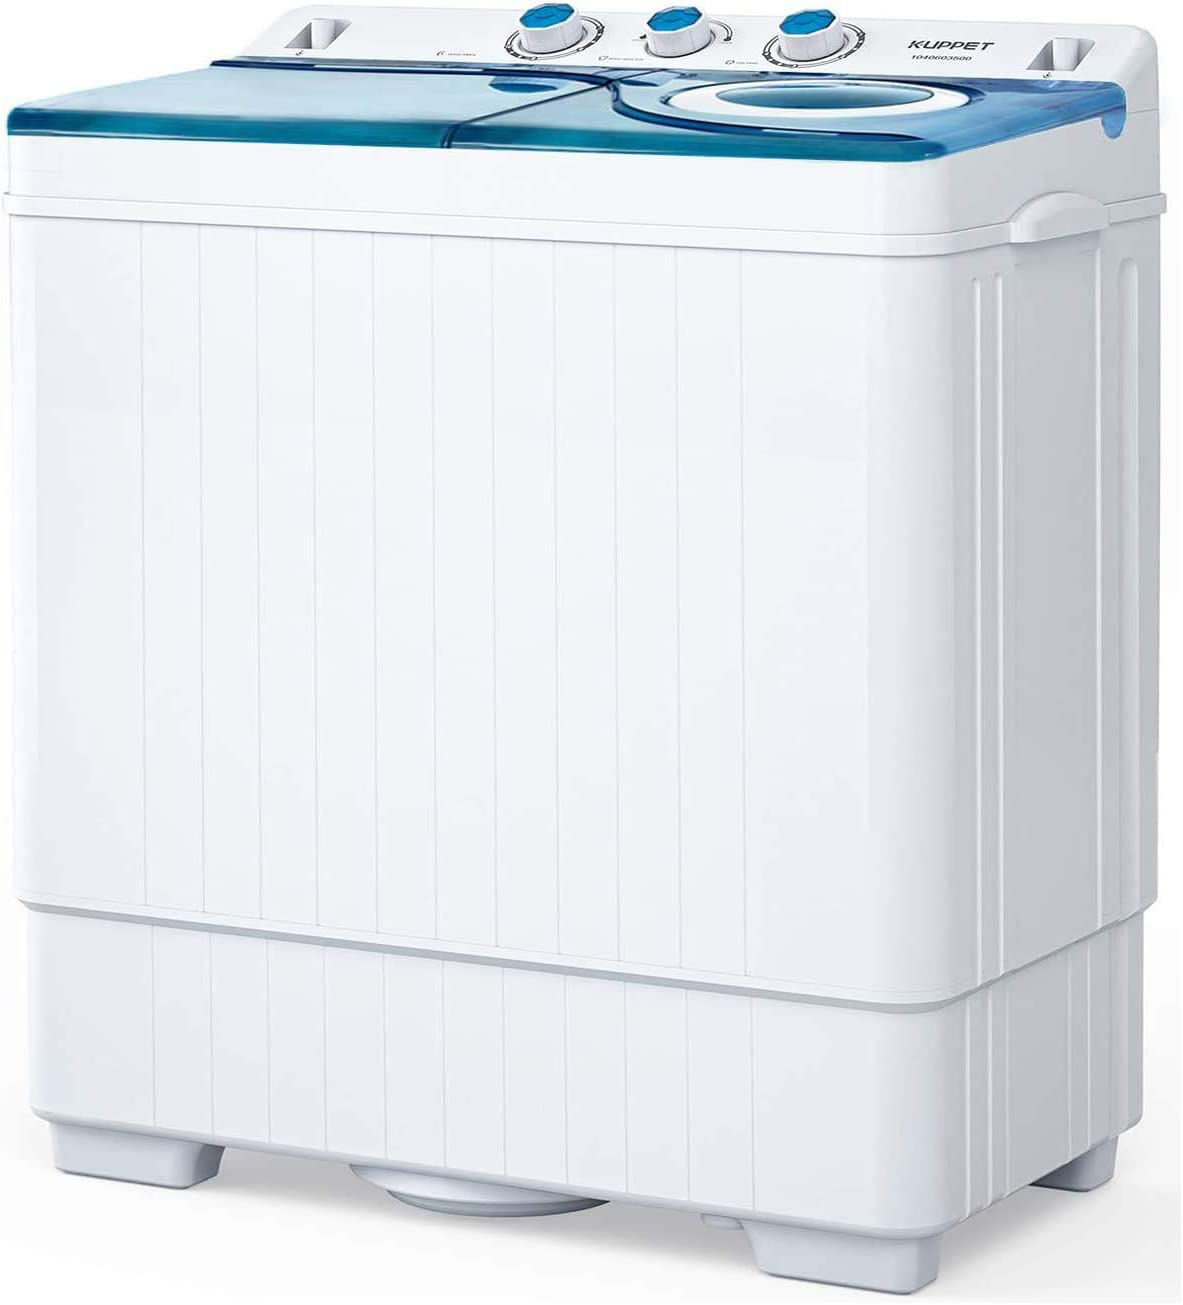 caravanas azul alimentada por USB Lavadora mini turbo port/átil con tina plegable compacta ultras/ónica de turbina de viaje lavadora para camping dormitorios apartamentos ligera